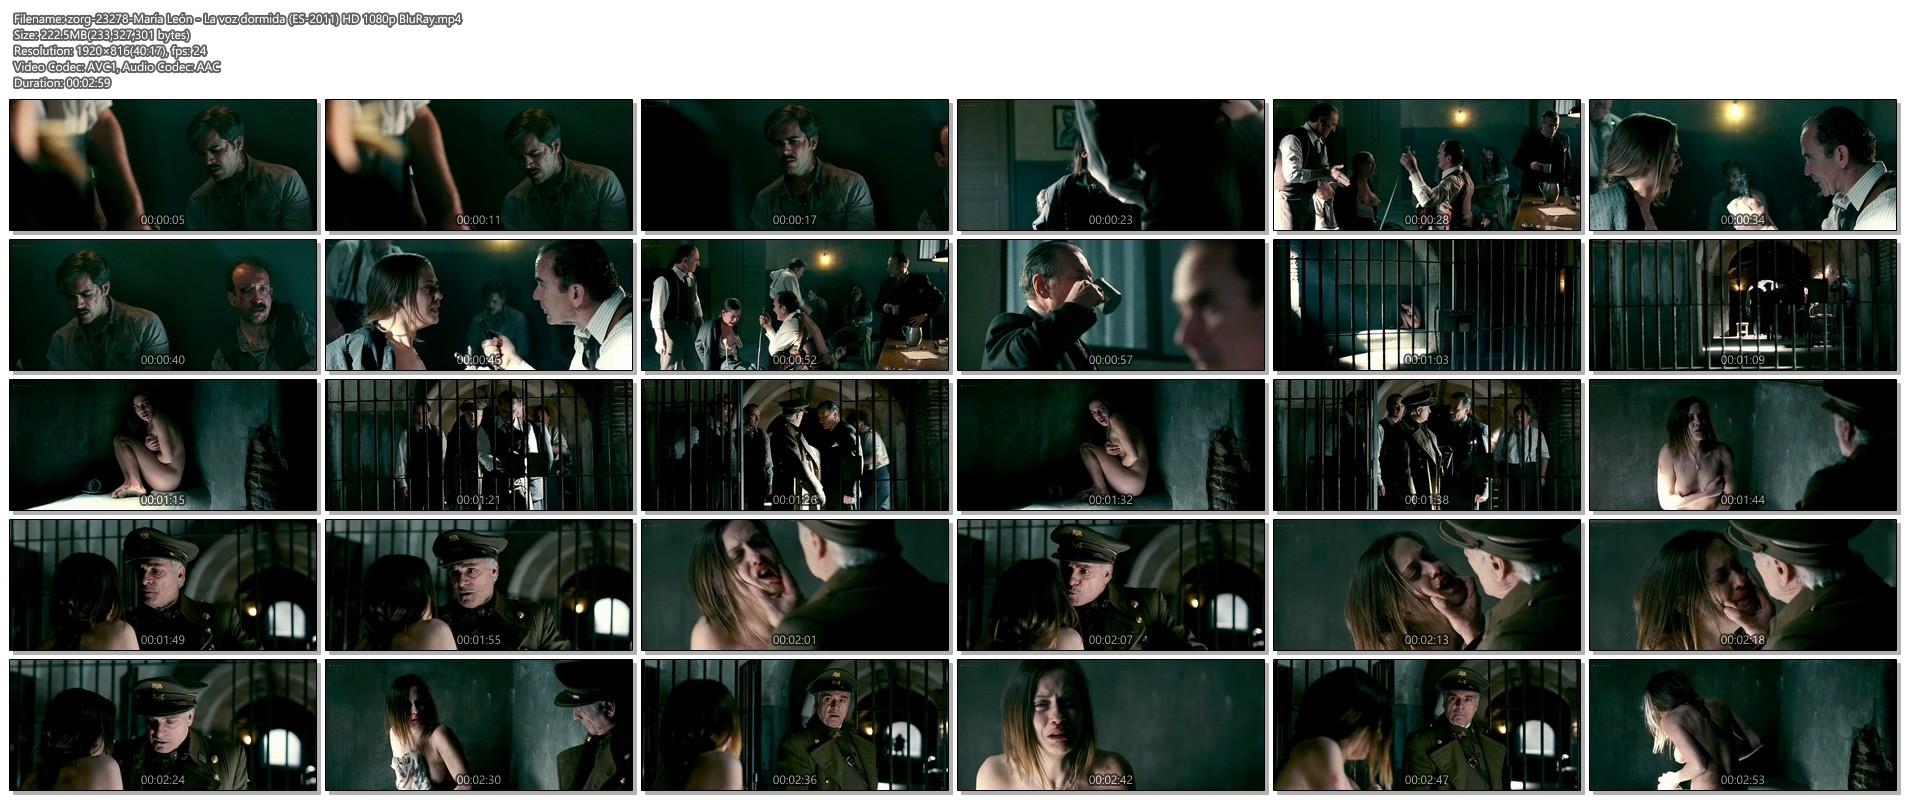 Maria Leon nude in - La voz dormida (2011) HD 1080p BluRay (1)